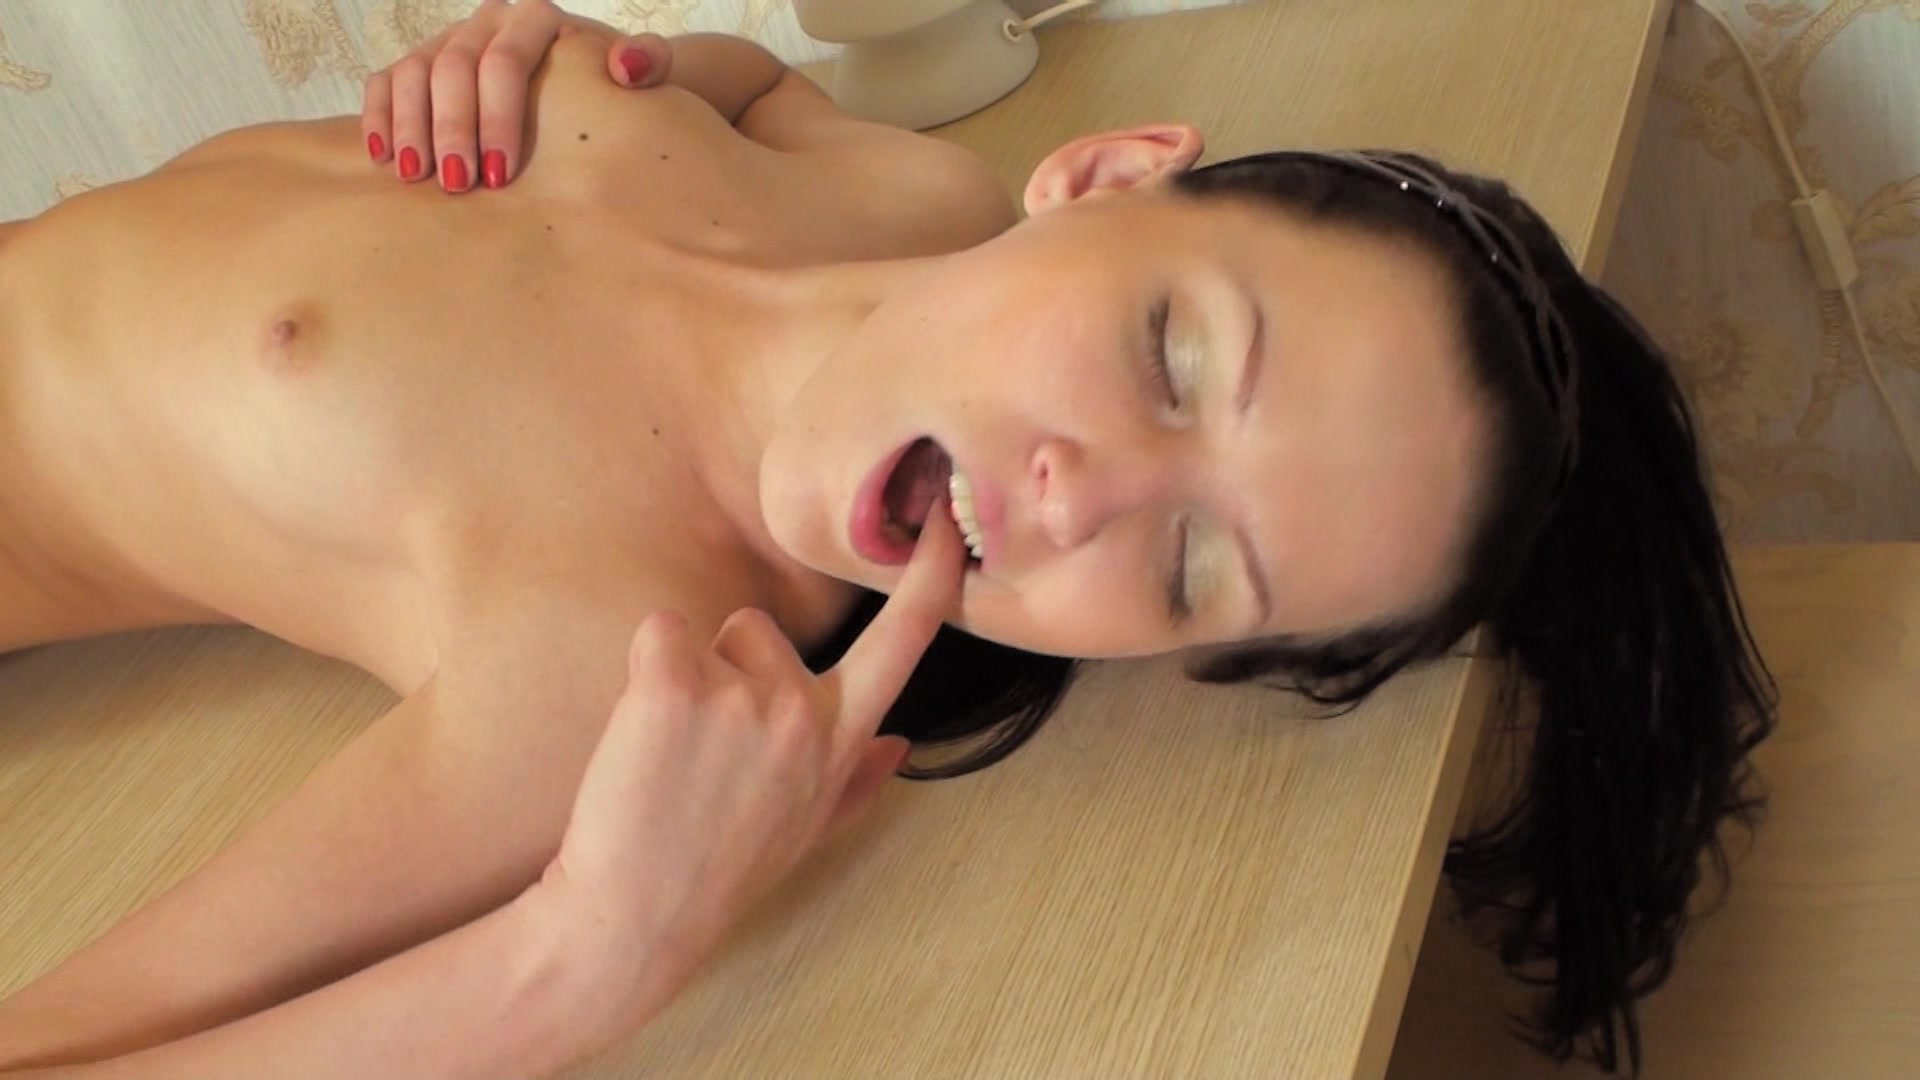 homemade hot tub sex videos